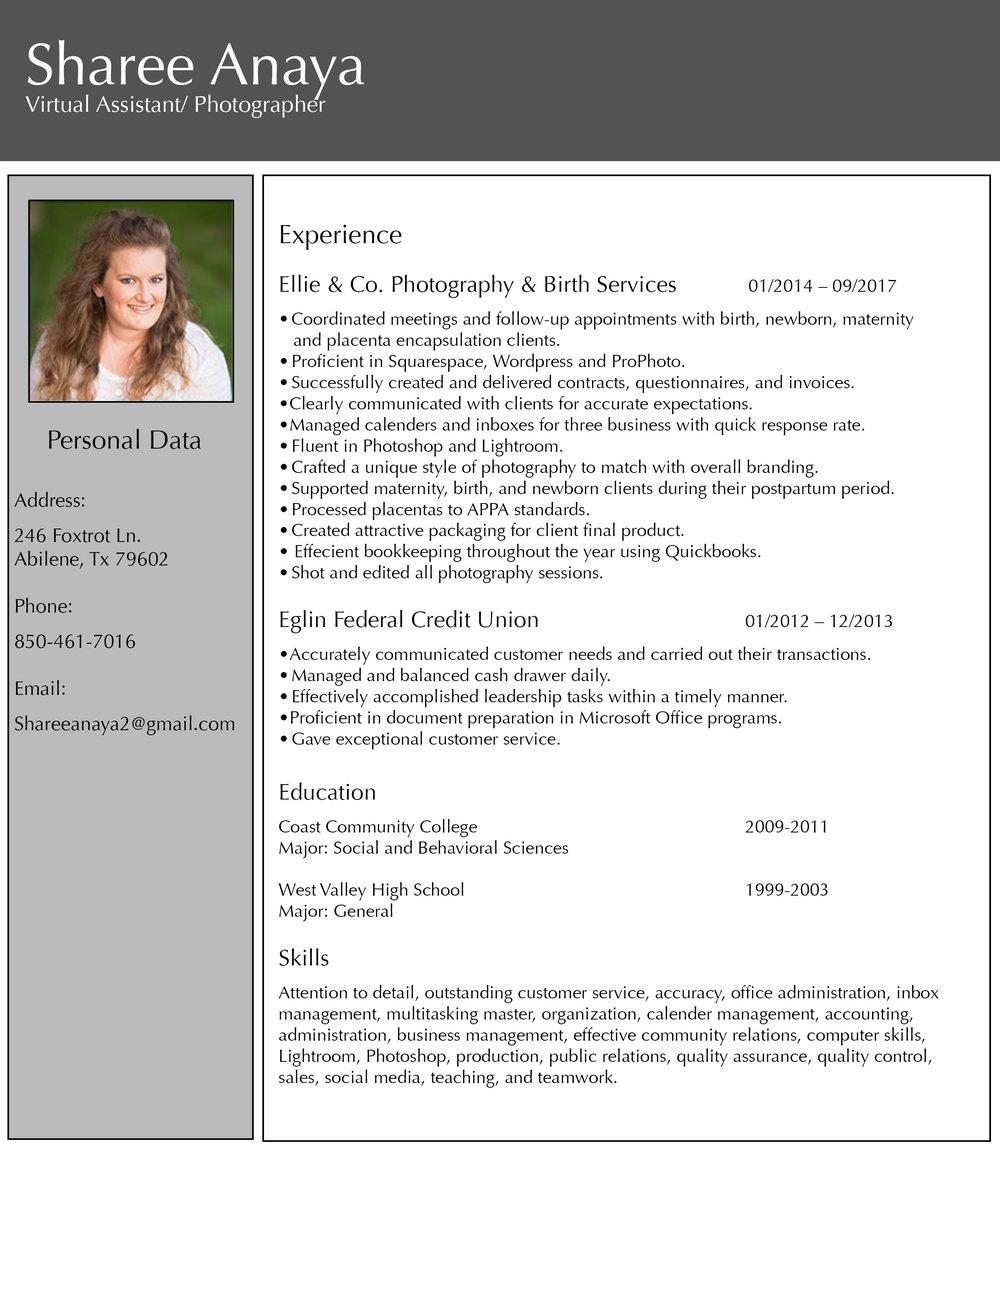 Home - Virtual Assistant- Sharee Anaya